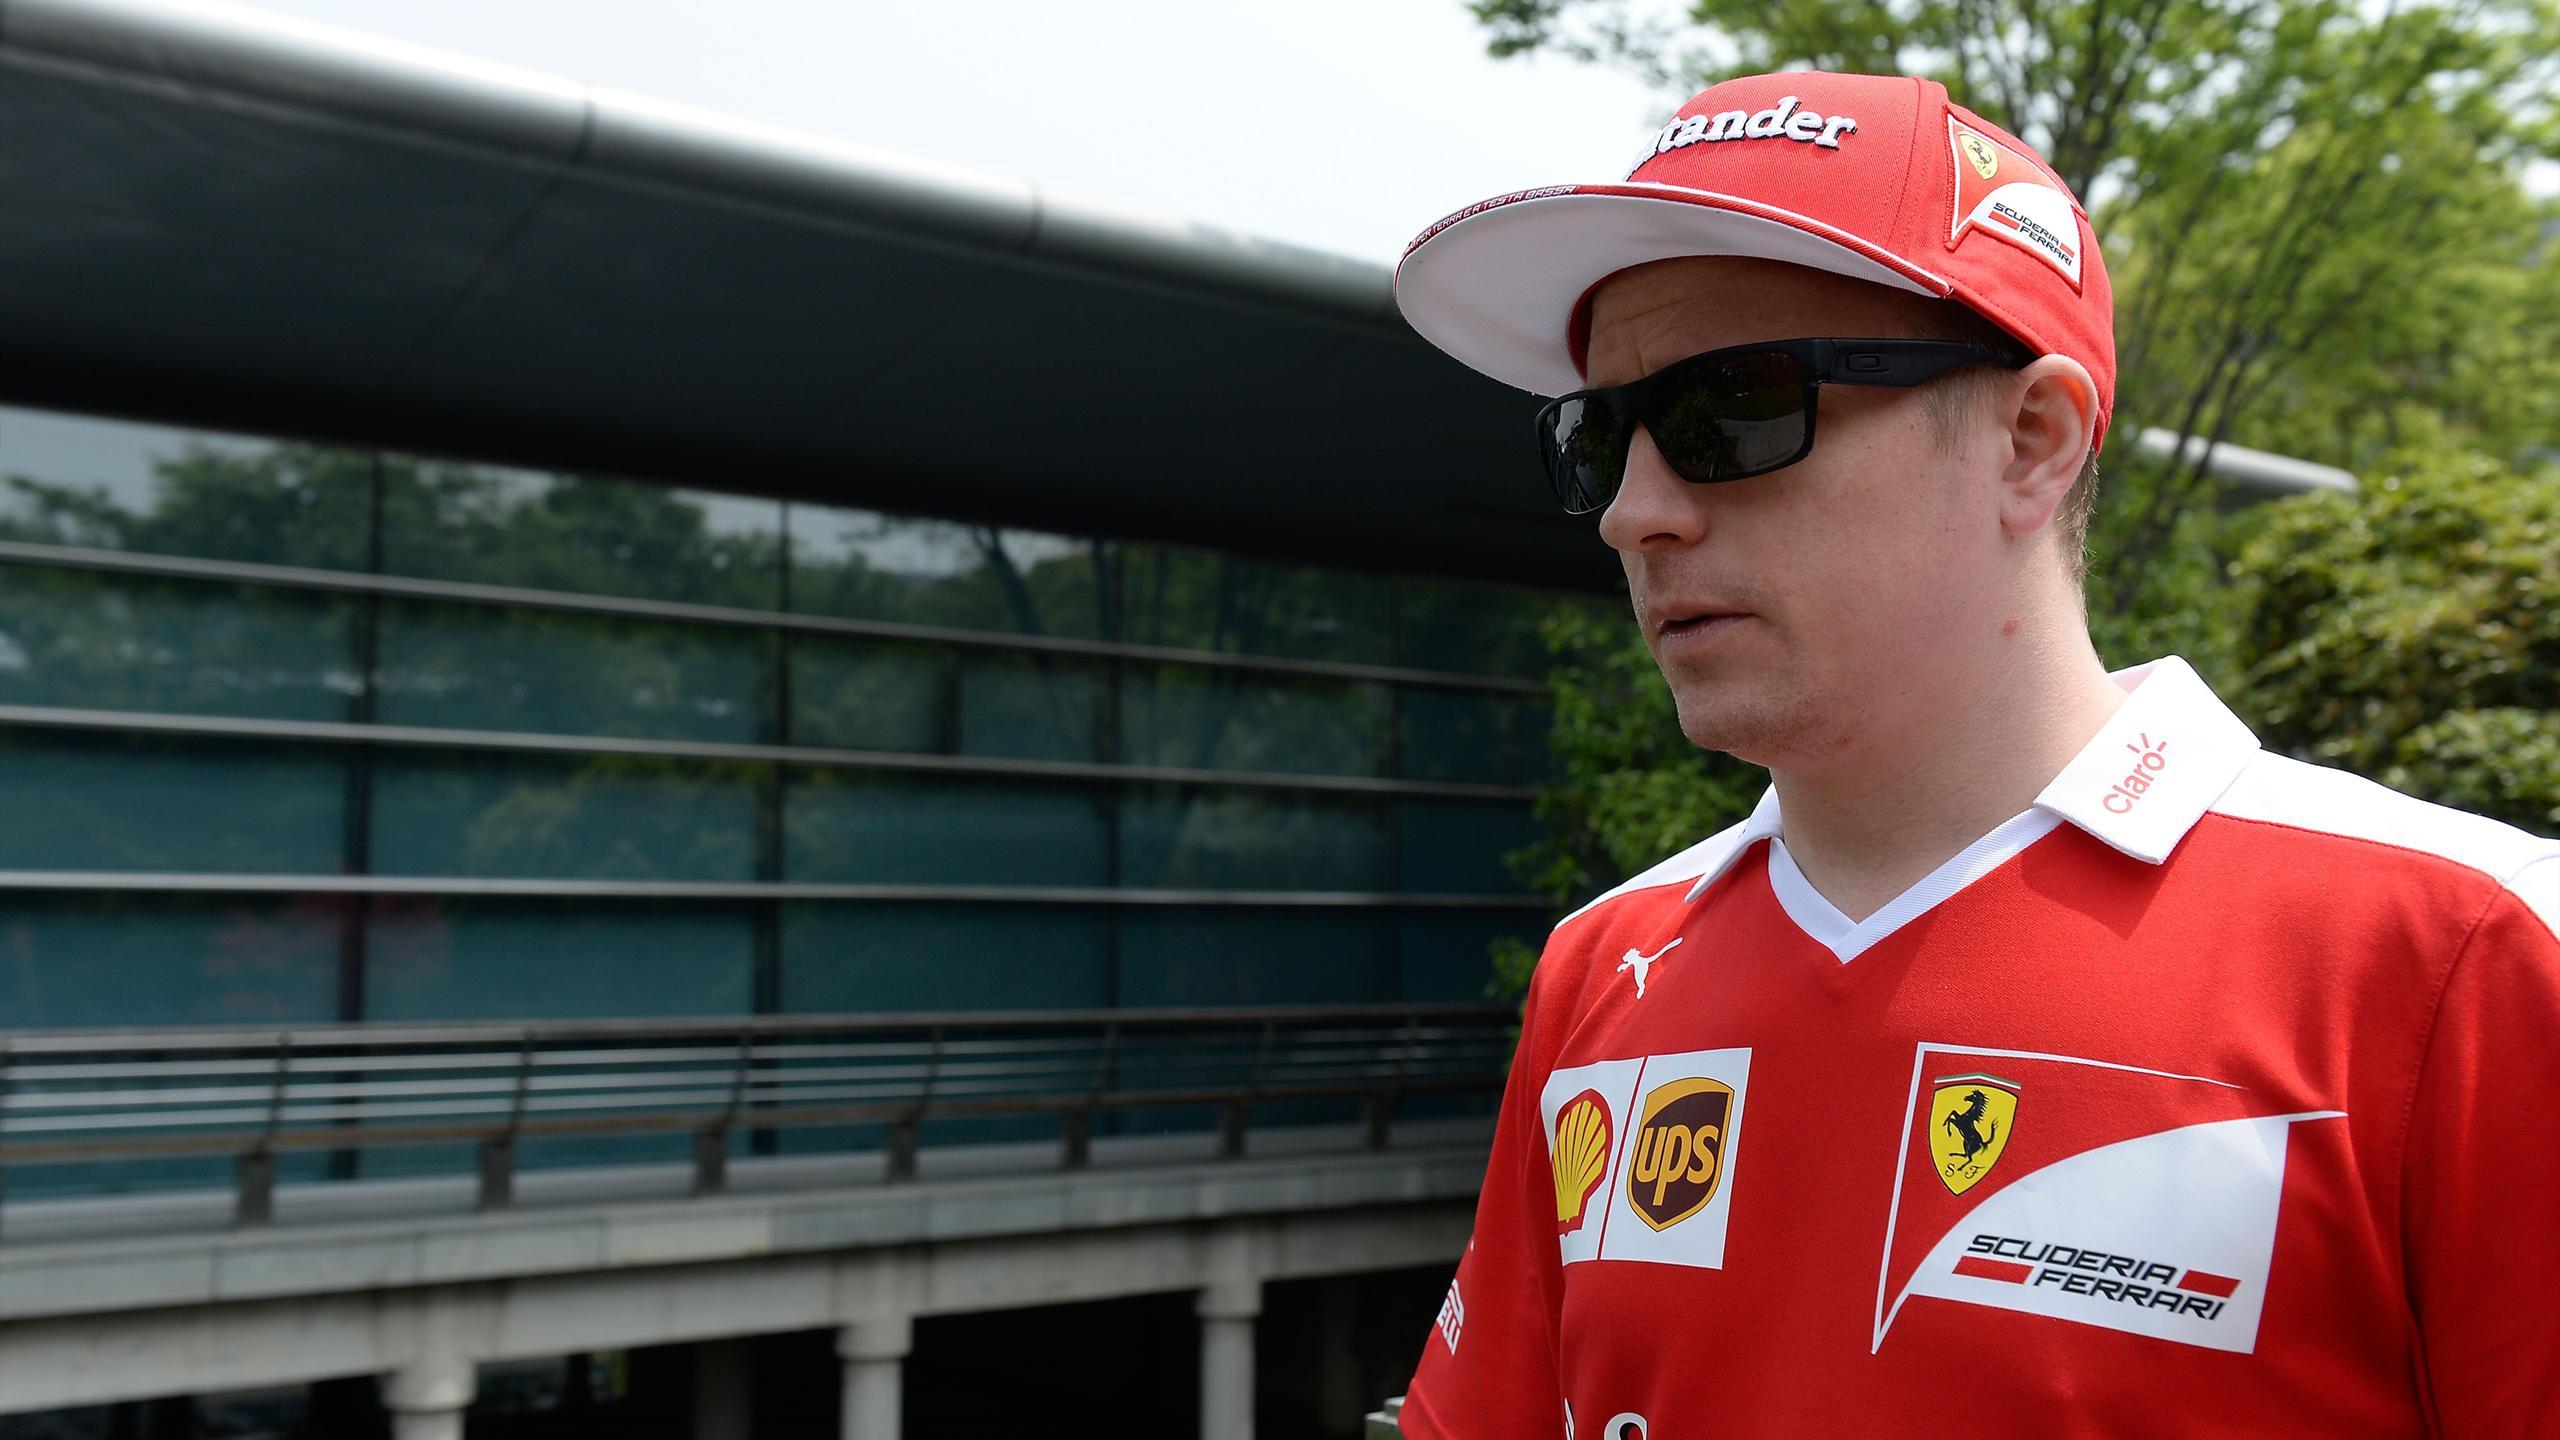 Kimi Räikkönen (Ferrari) au Grand Prix de Chine 2016